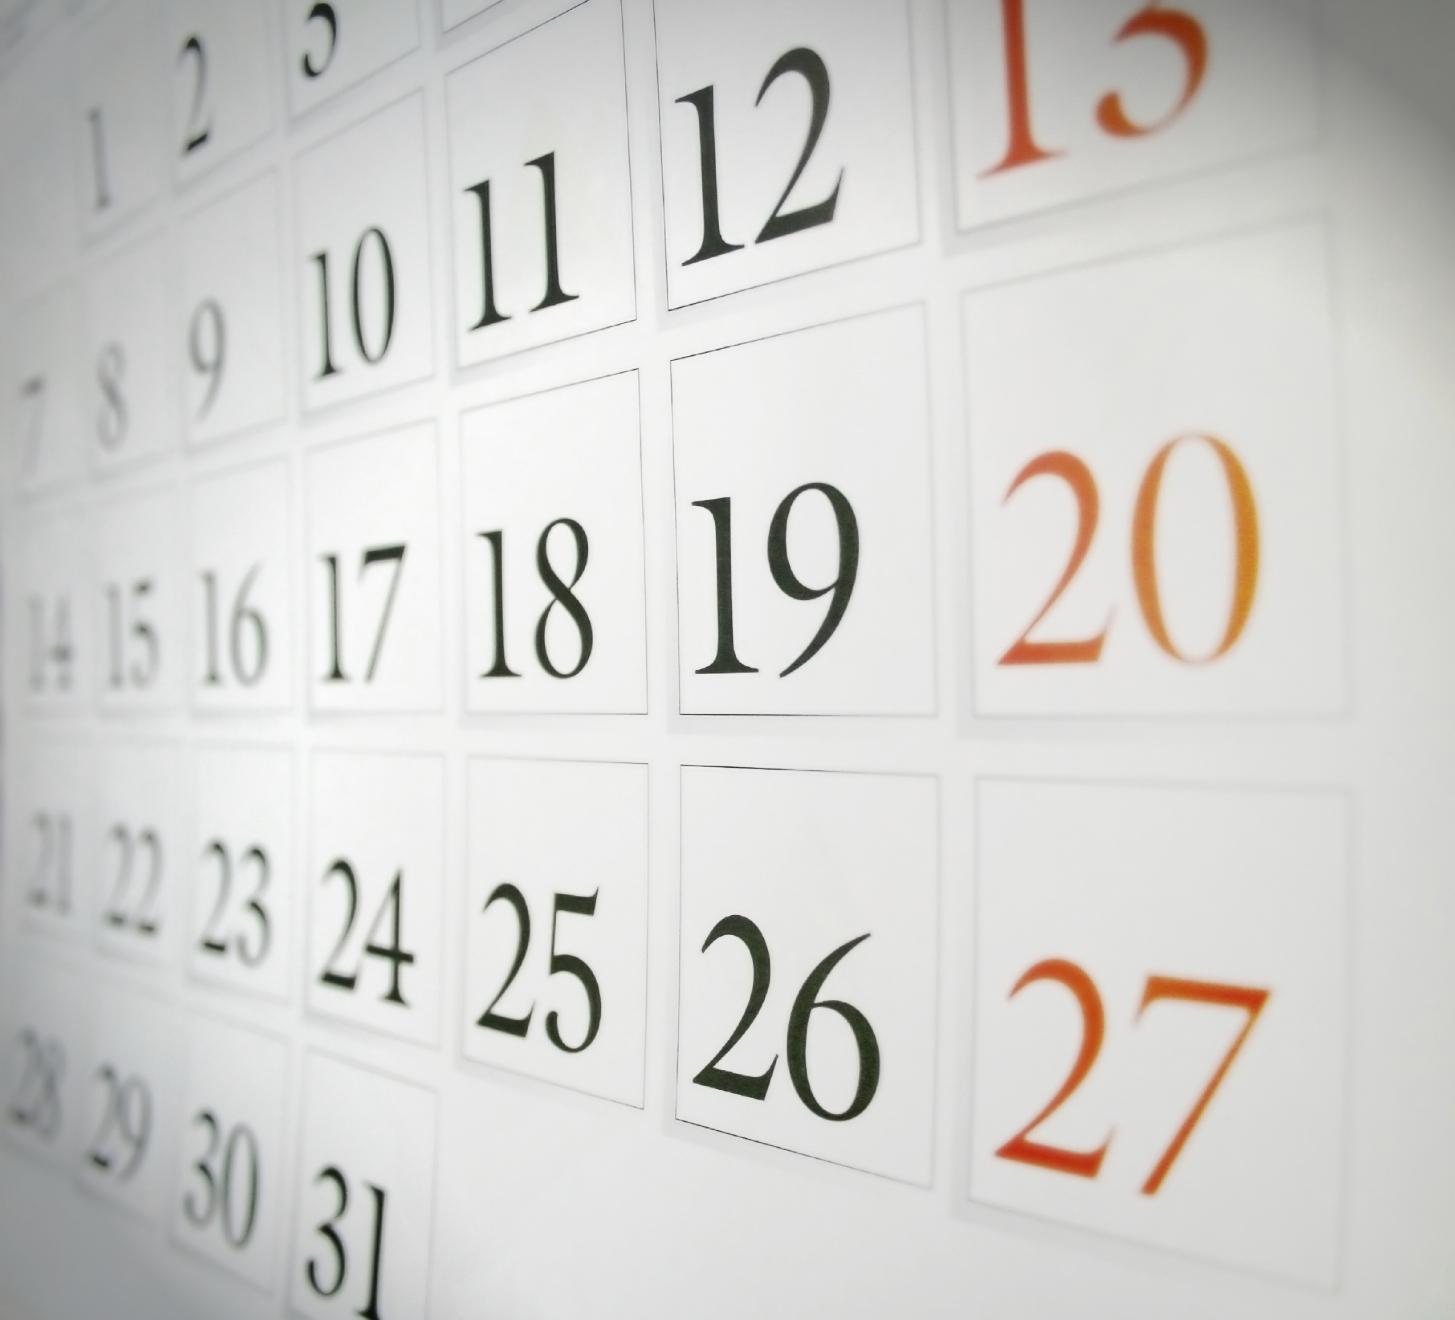 Weekend Reform Proposal Rejected | Financial Tribune